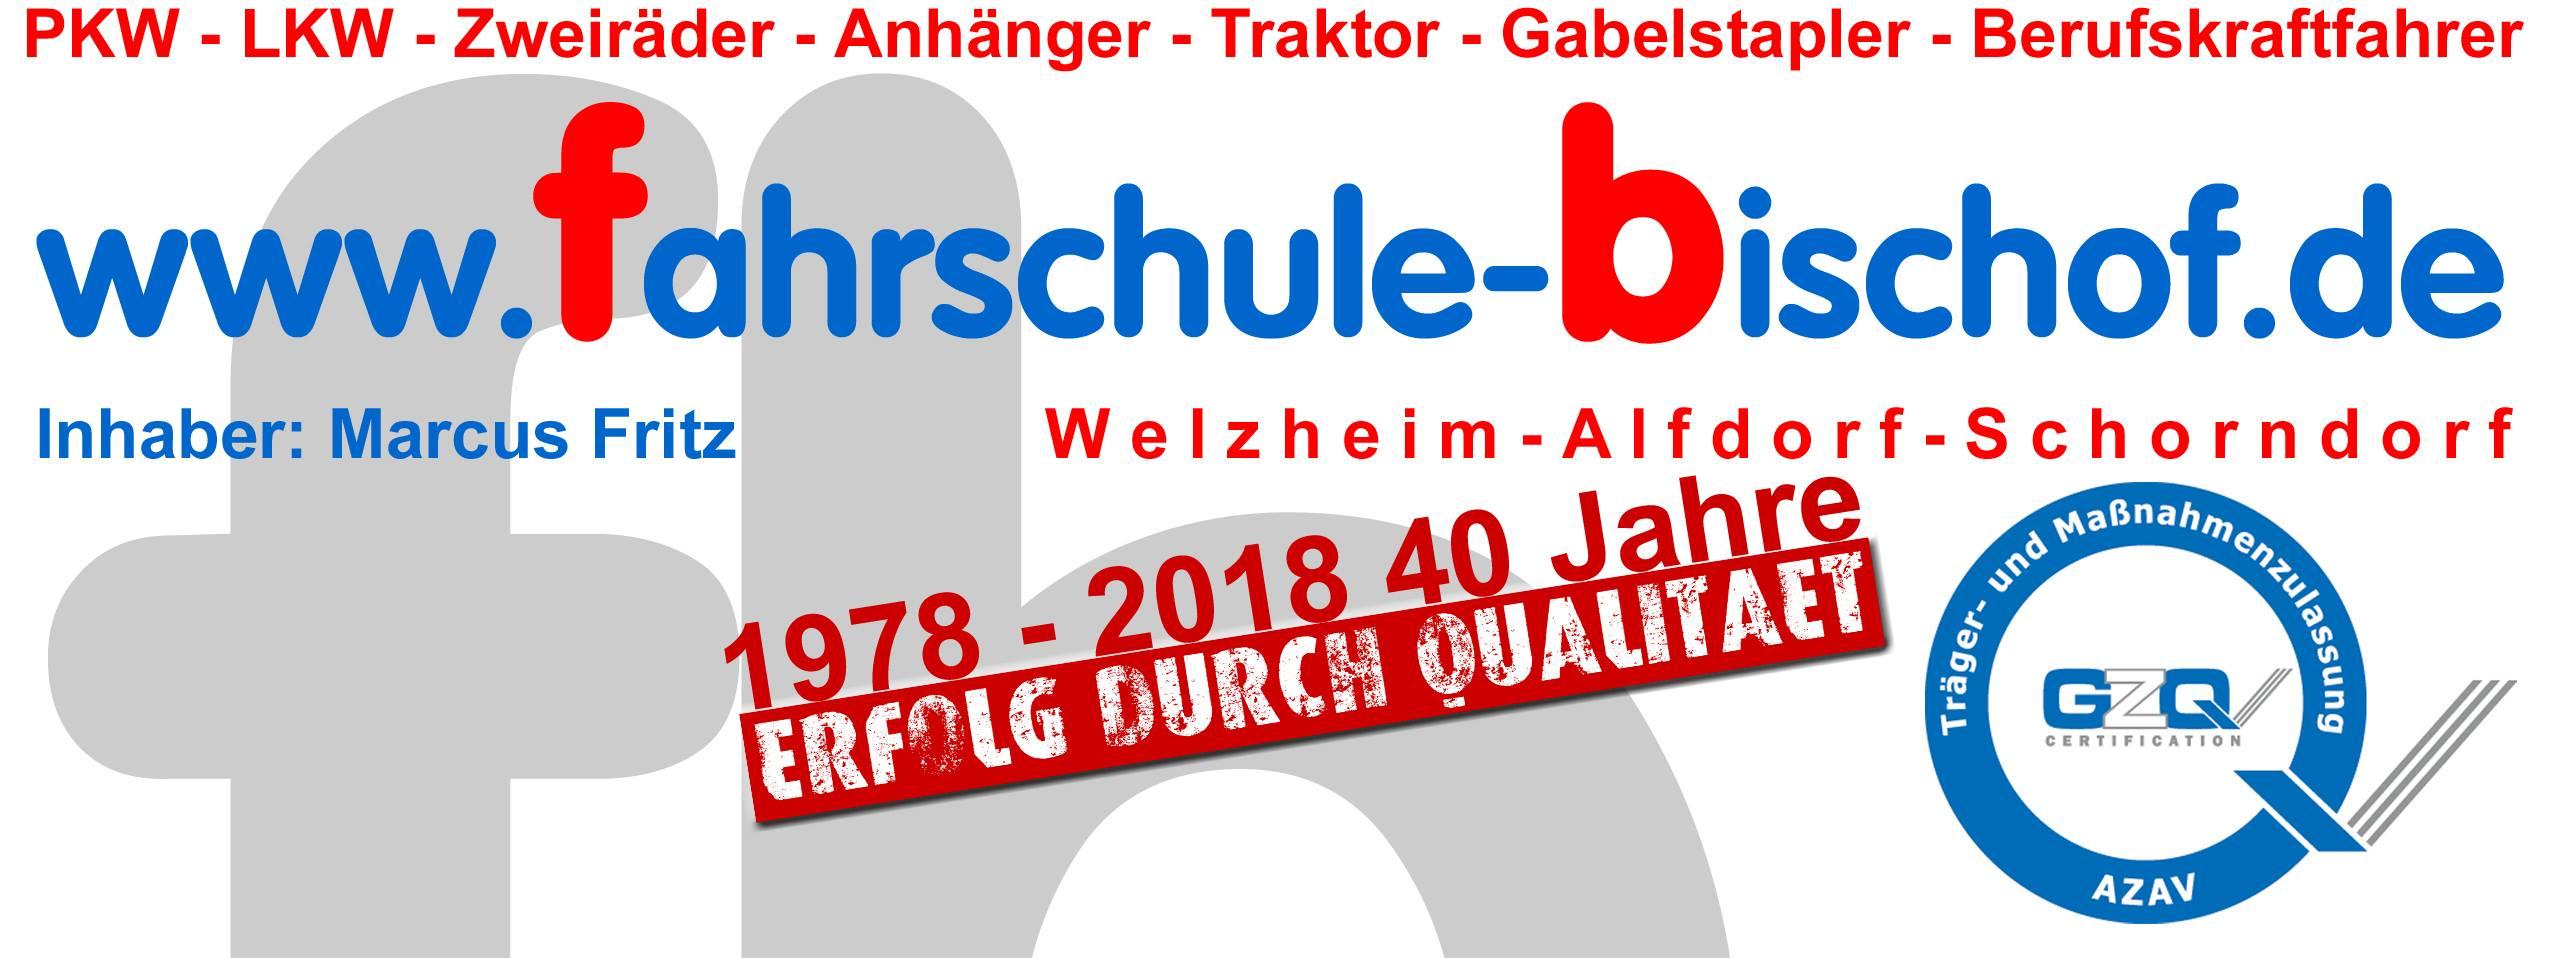 Logo Fahrschule Bischof